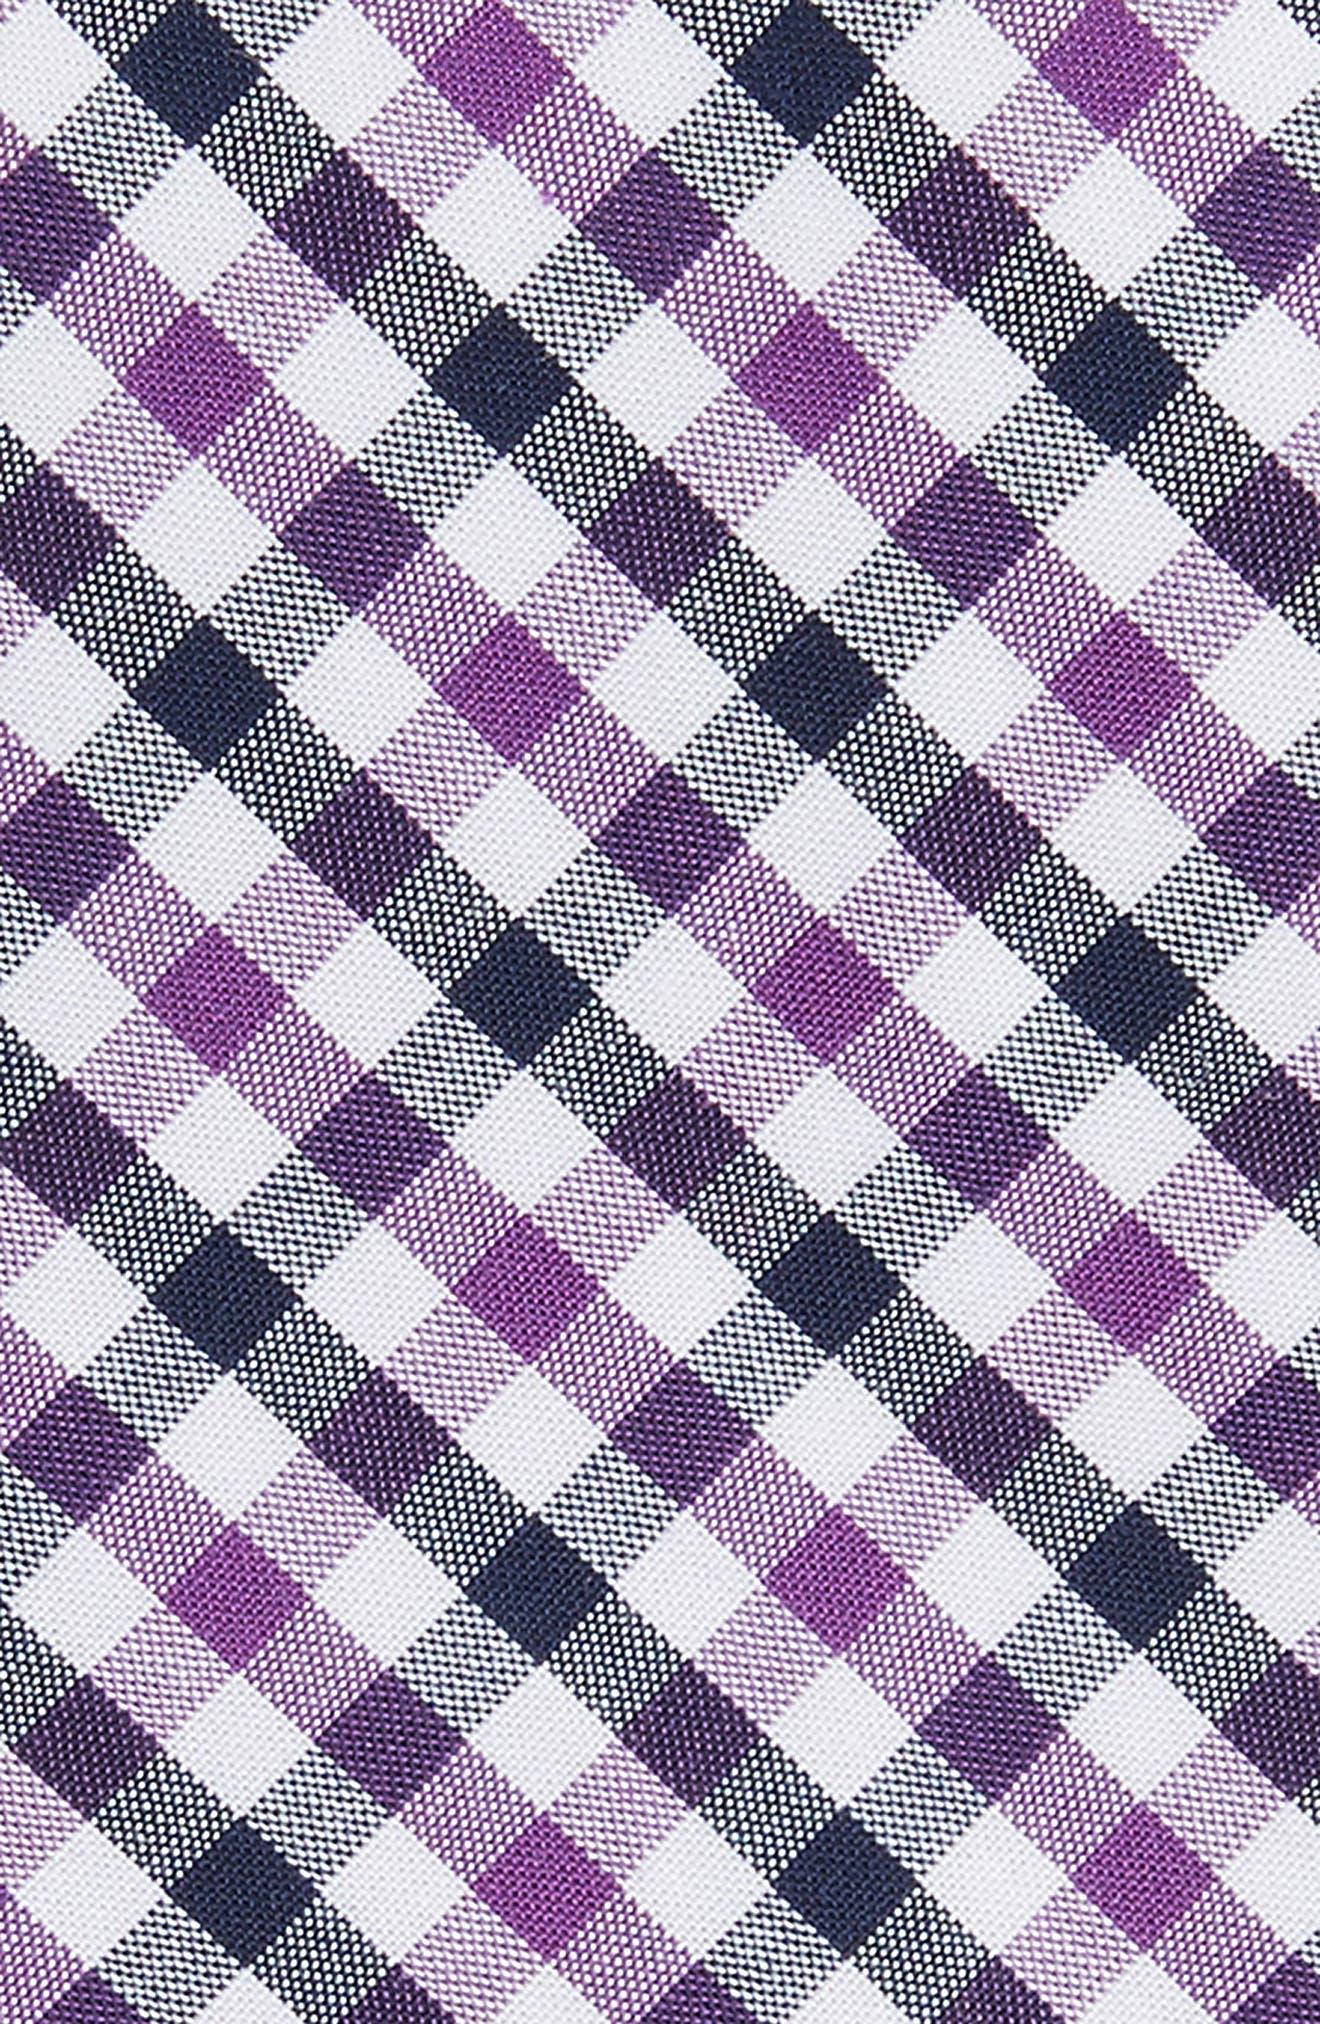 Robin Diamond Check Skinny Tie,                             Alternate thumbnail 8, color,